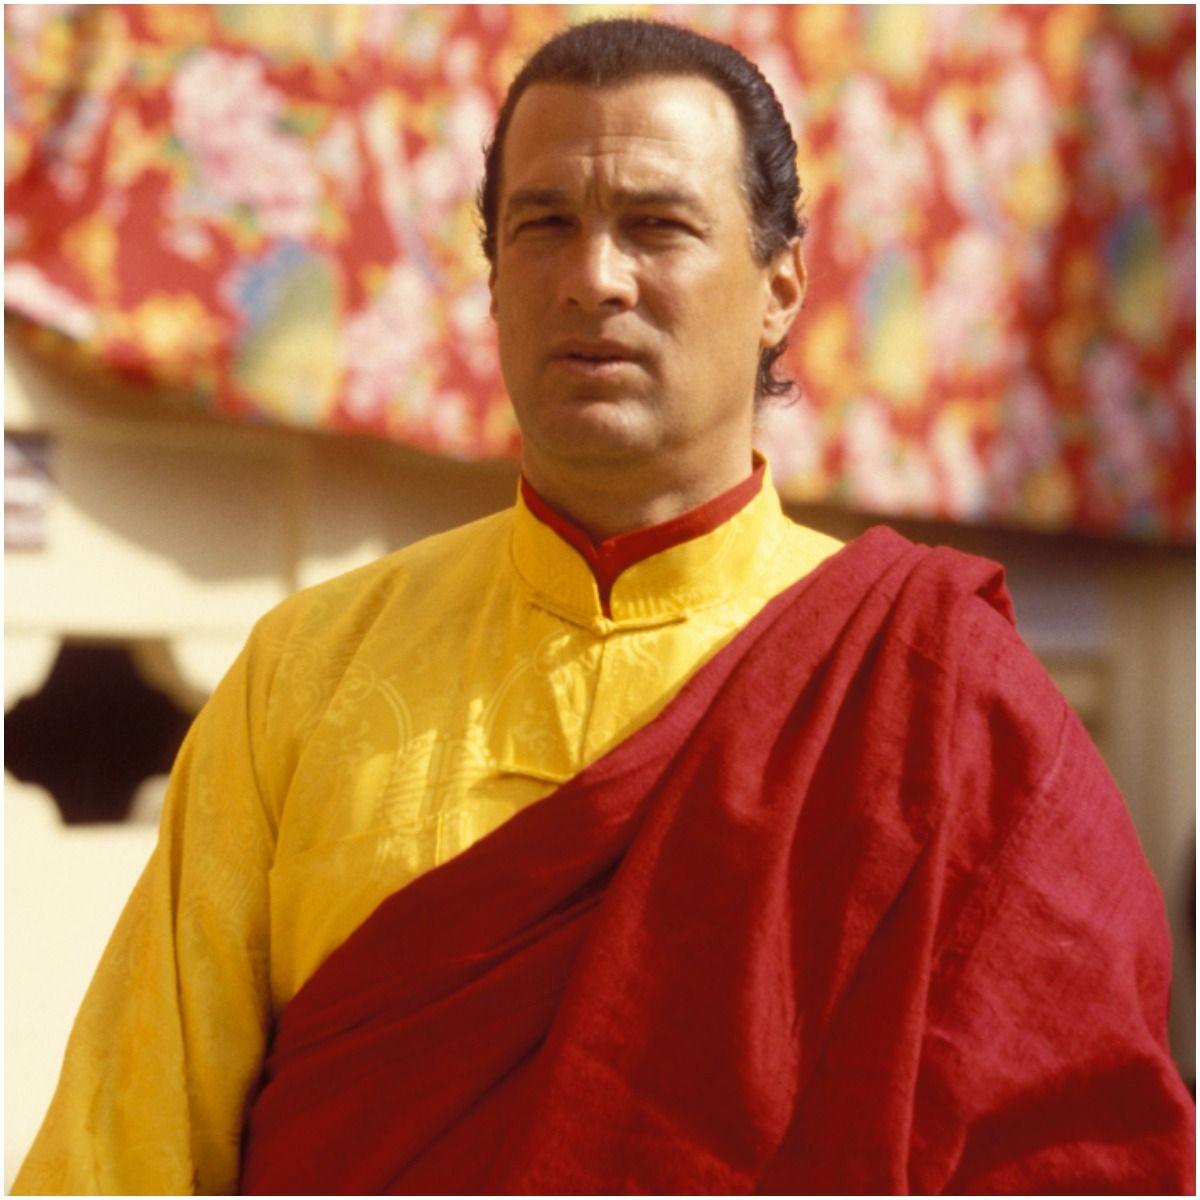 Steven Seagal buddhist